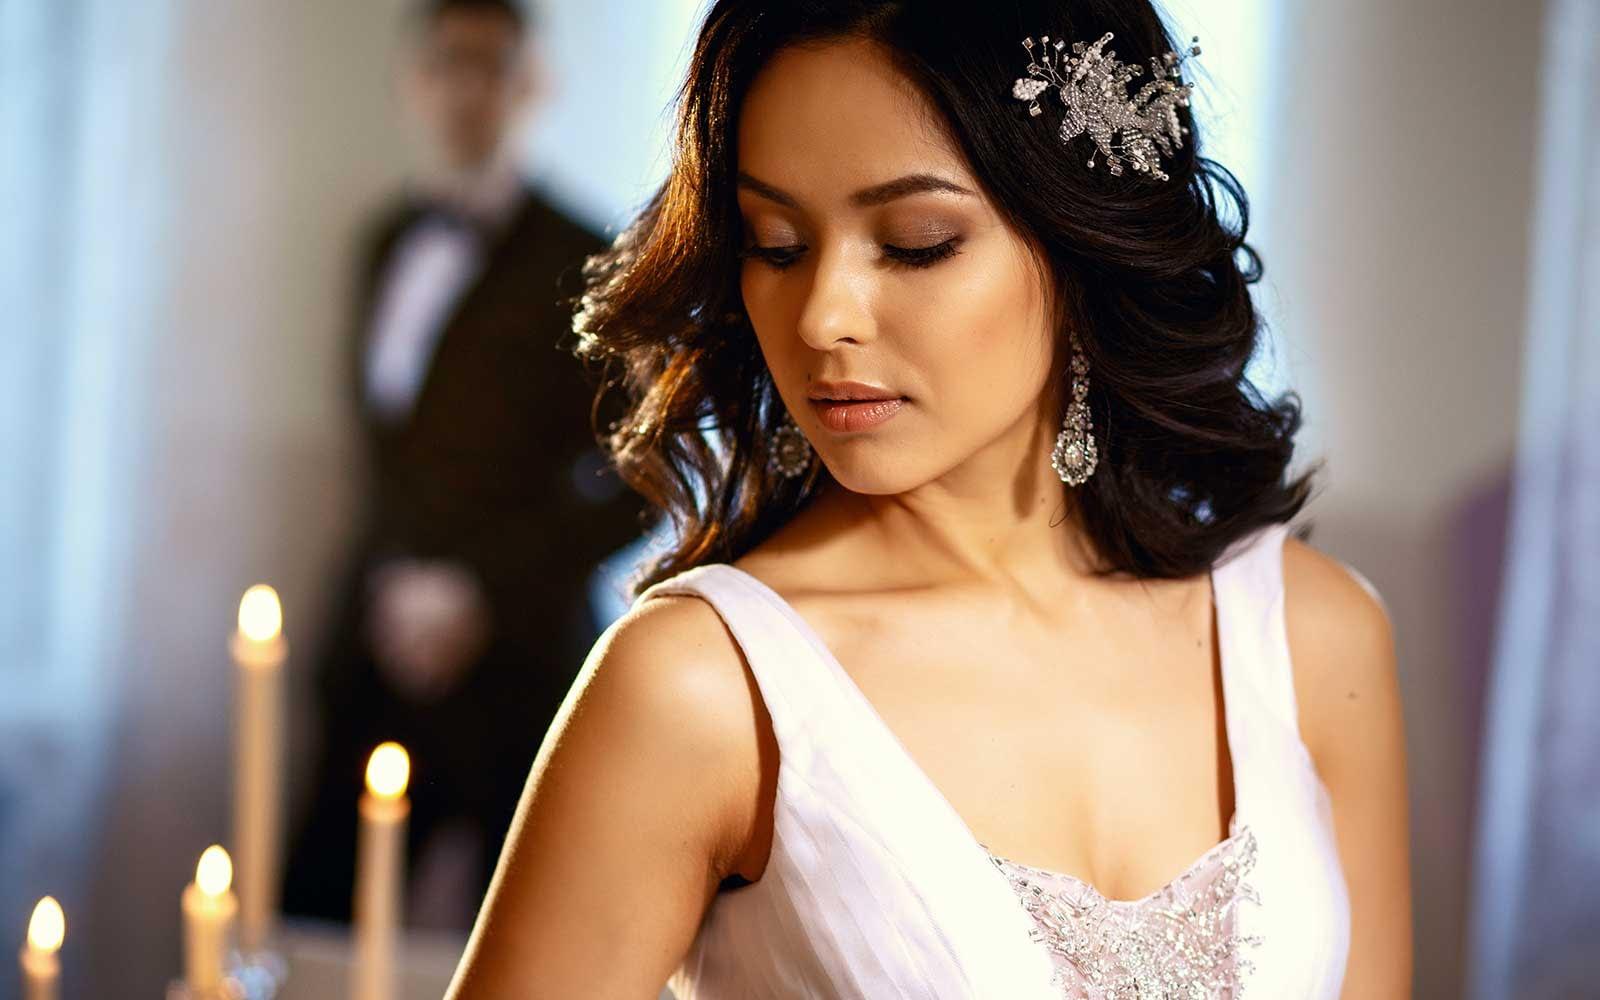 Elegant Bride with White Dress (Before applying the preset)